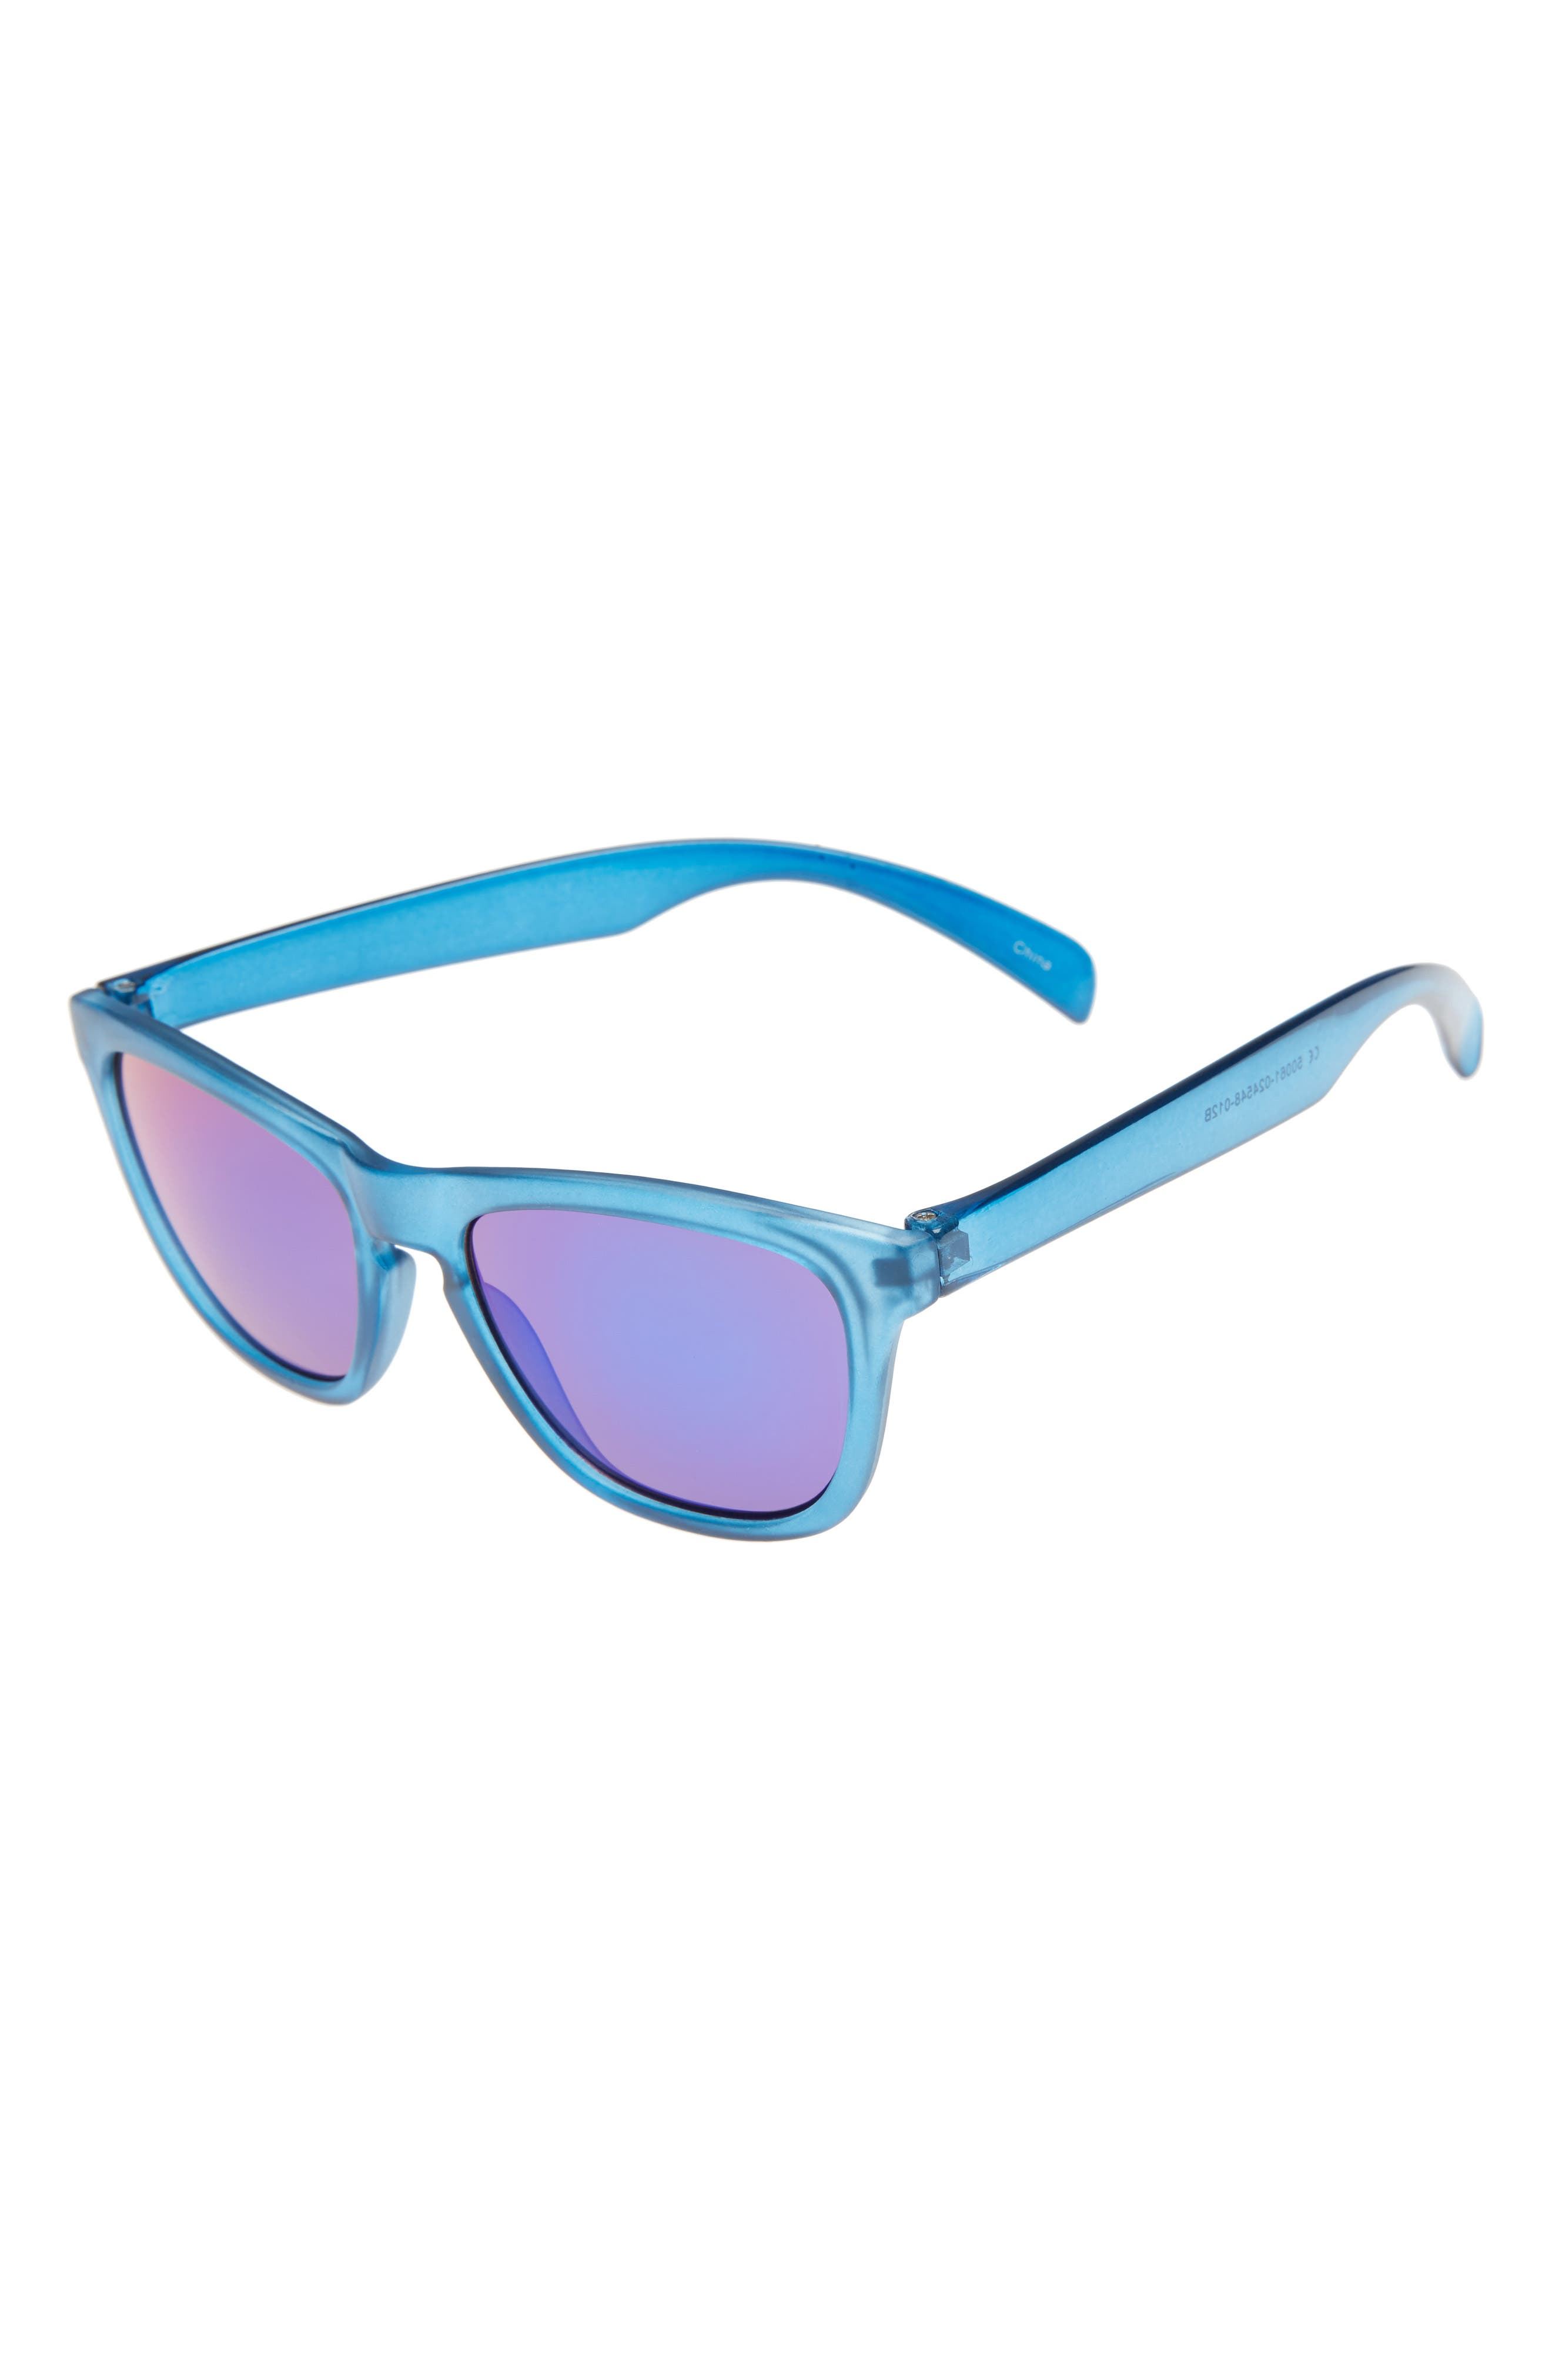 Icon Eyewear Mirrored Sunglasses (Boys)